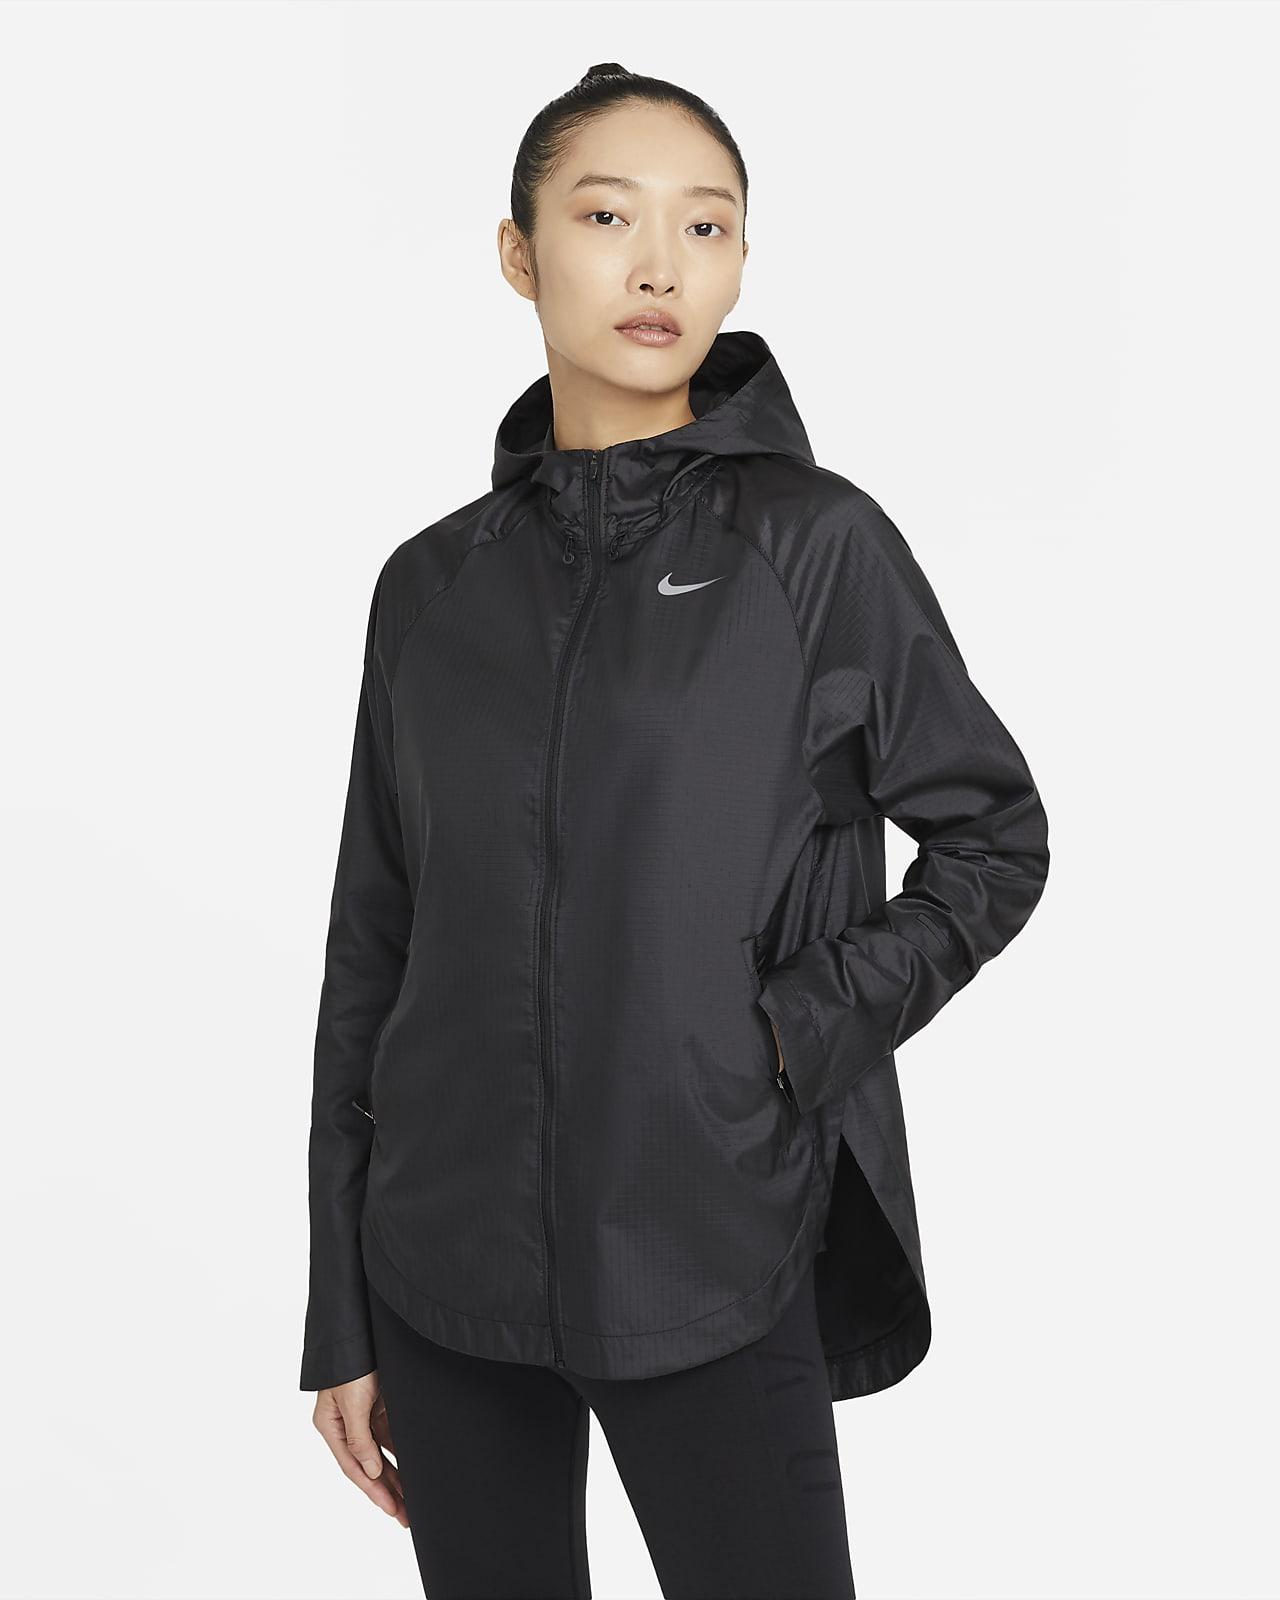 Chamarra de running para mujer Nike Essential Run Division